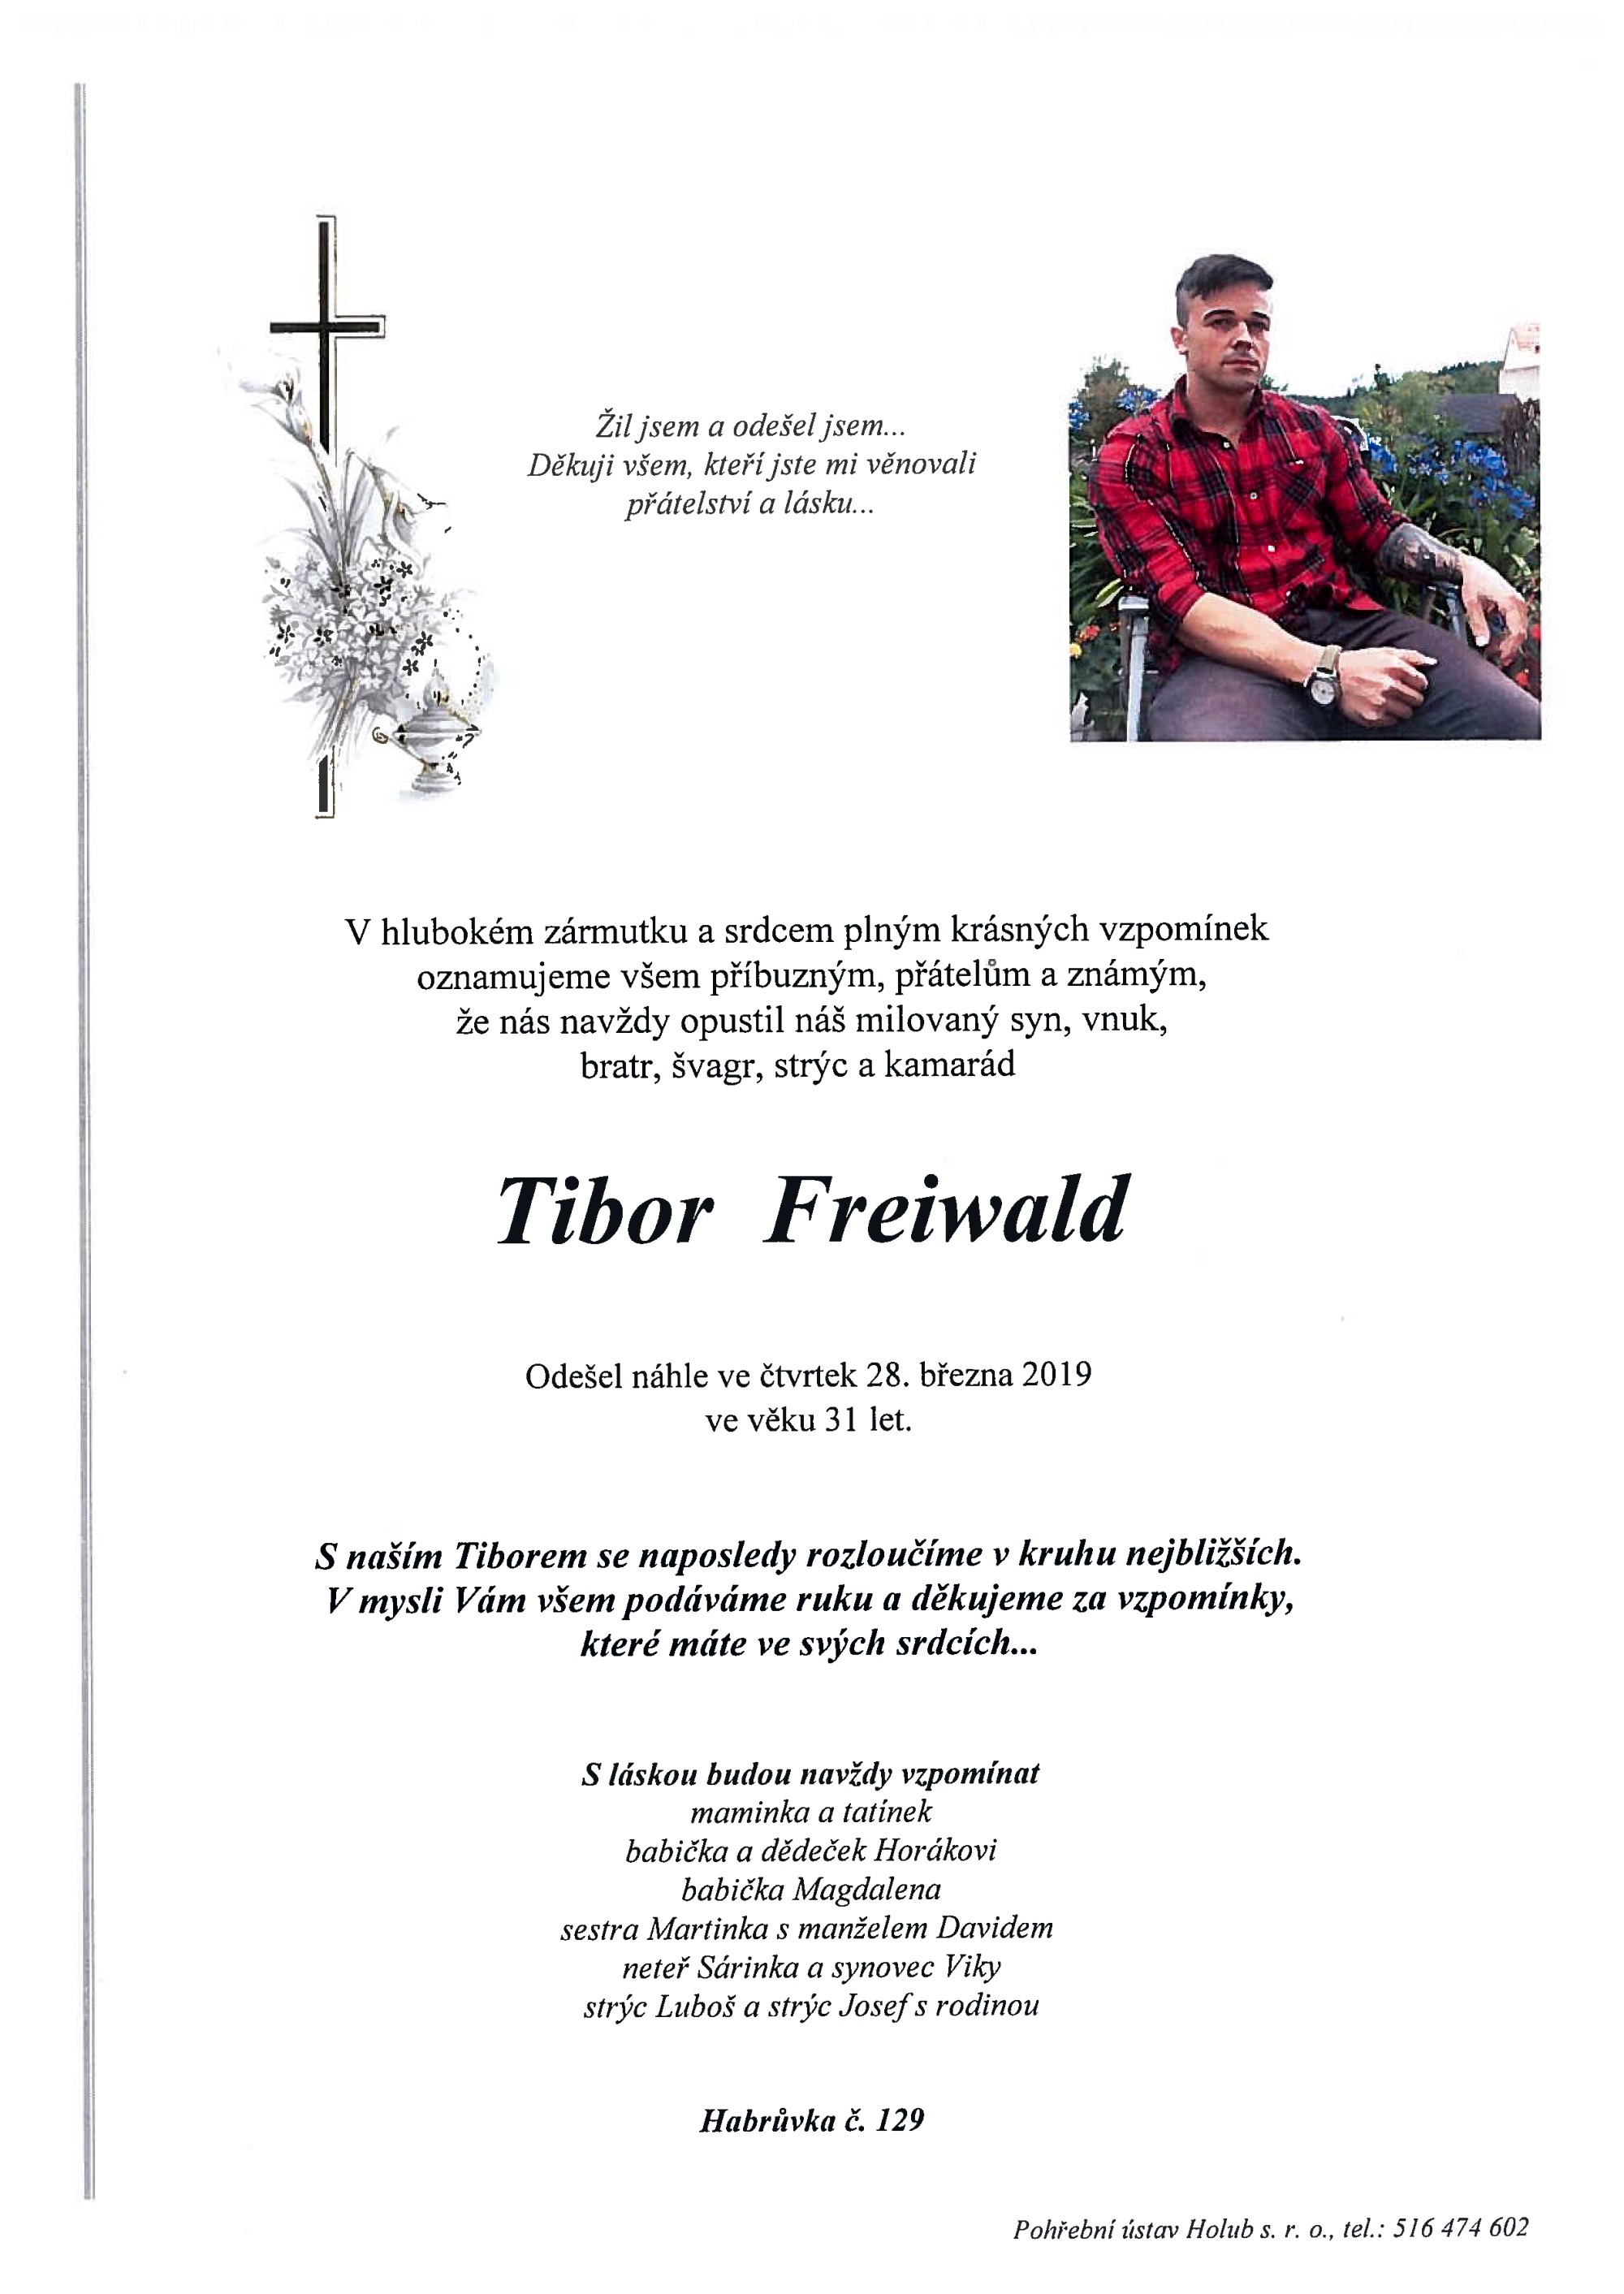 Tibor Freiwald